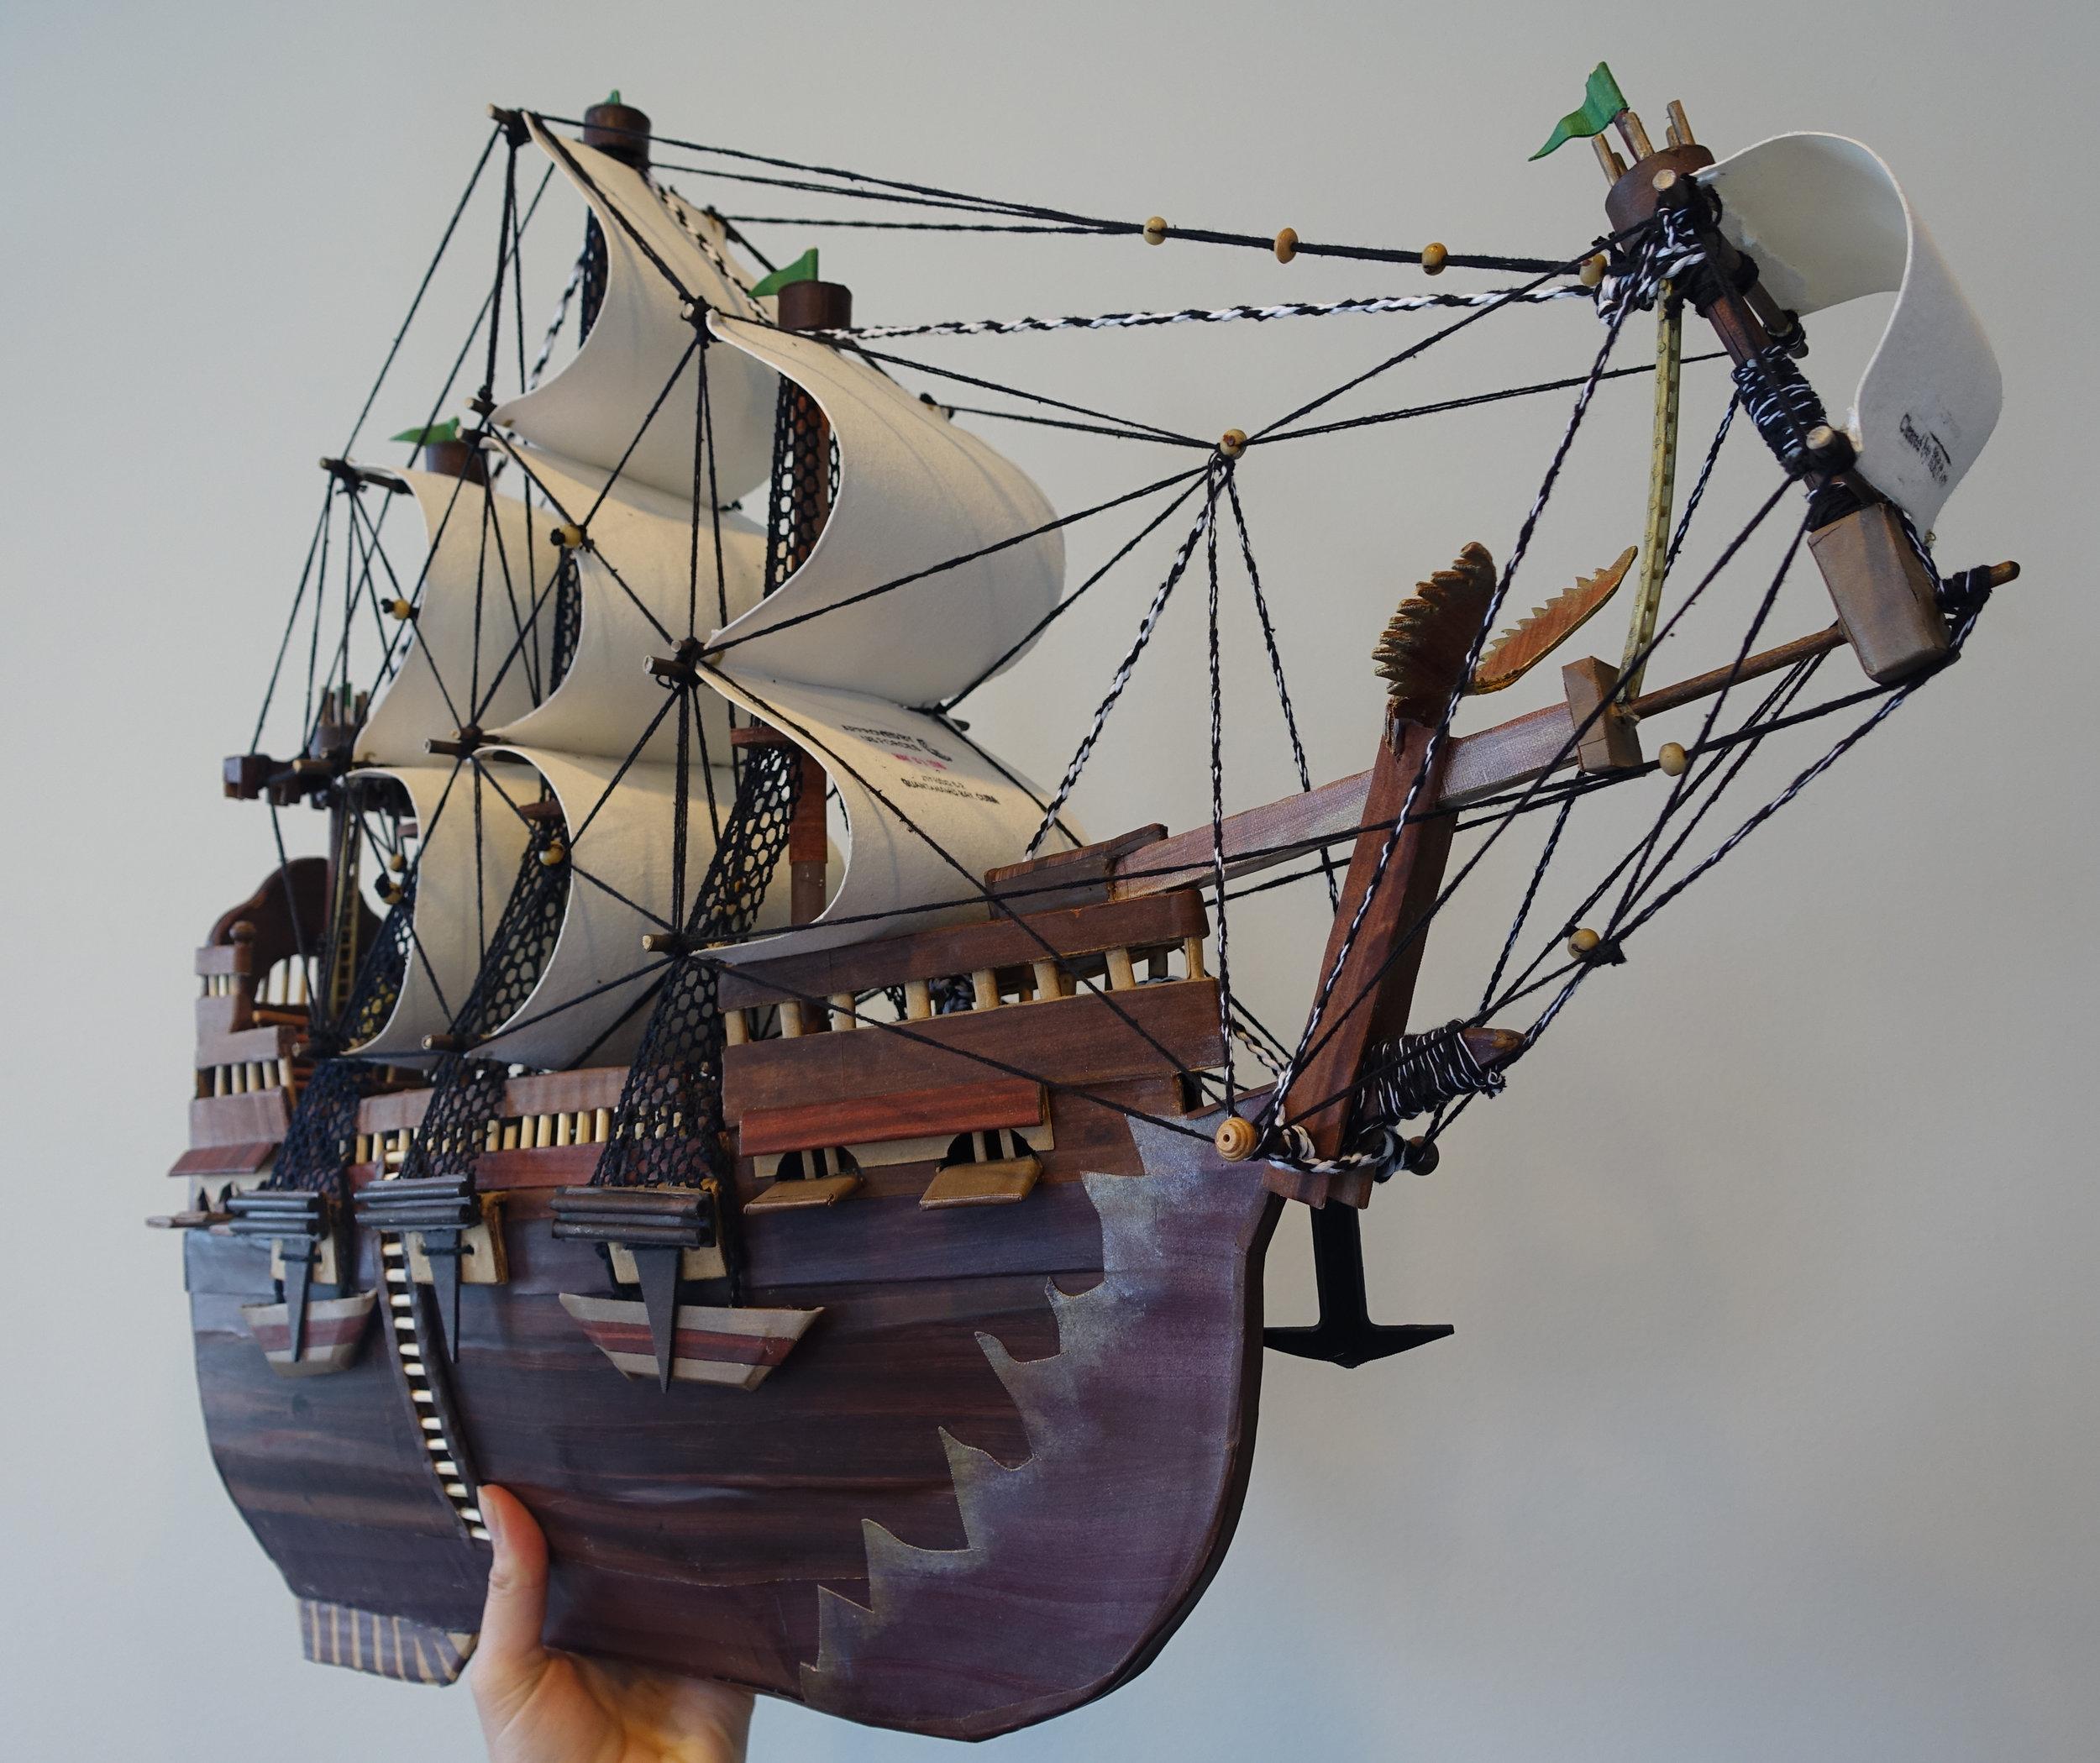 Moath al-Alwi,Model of a Ship, 2015.